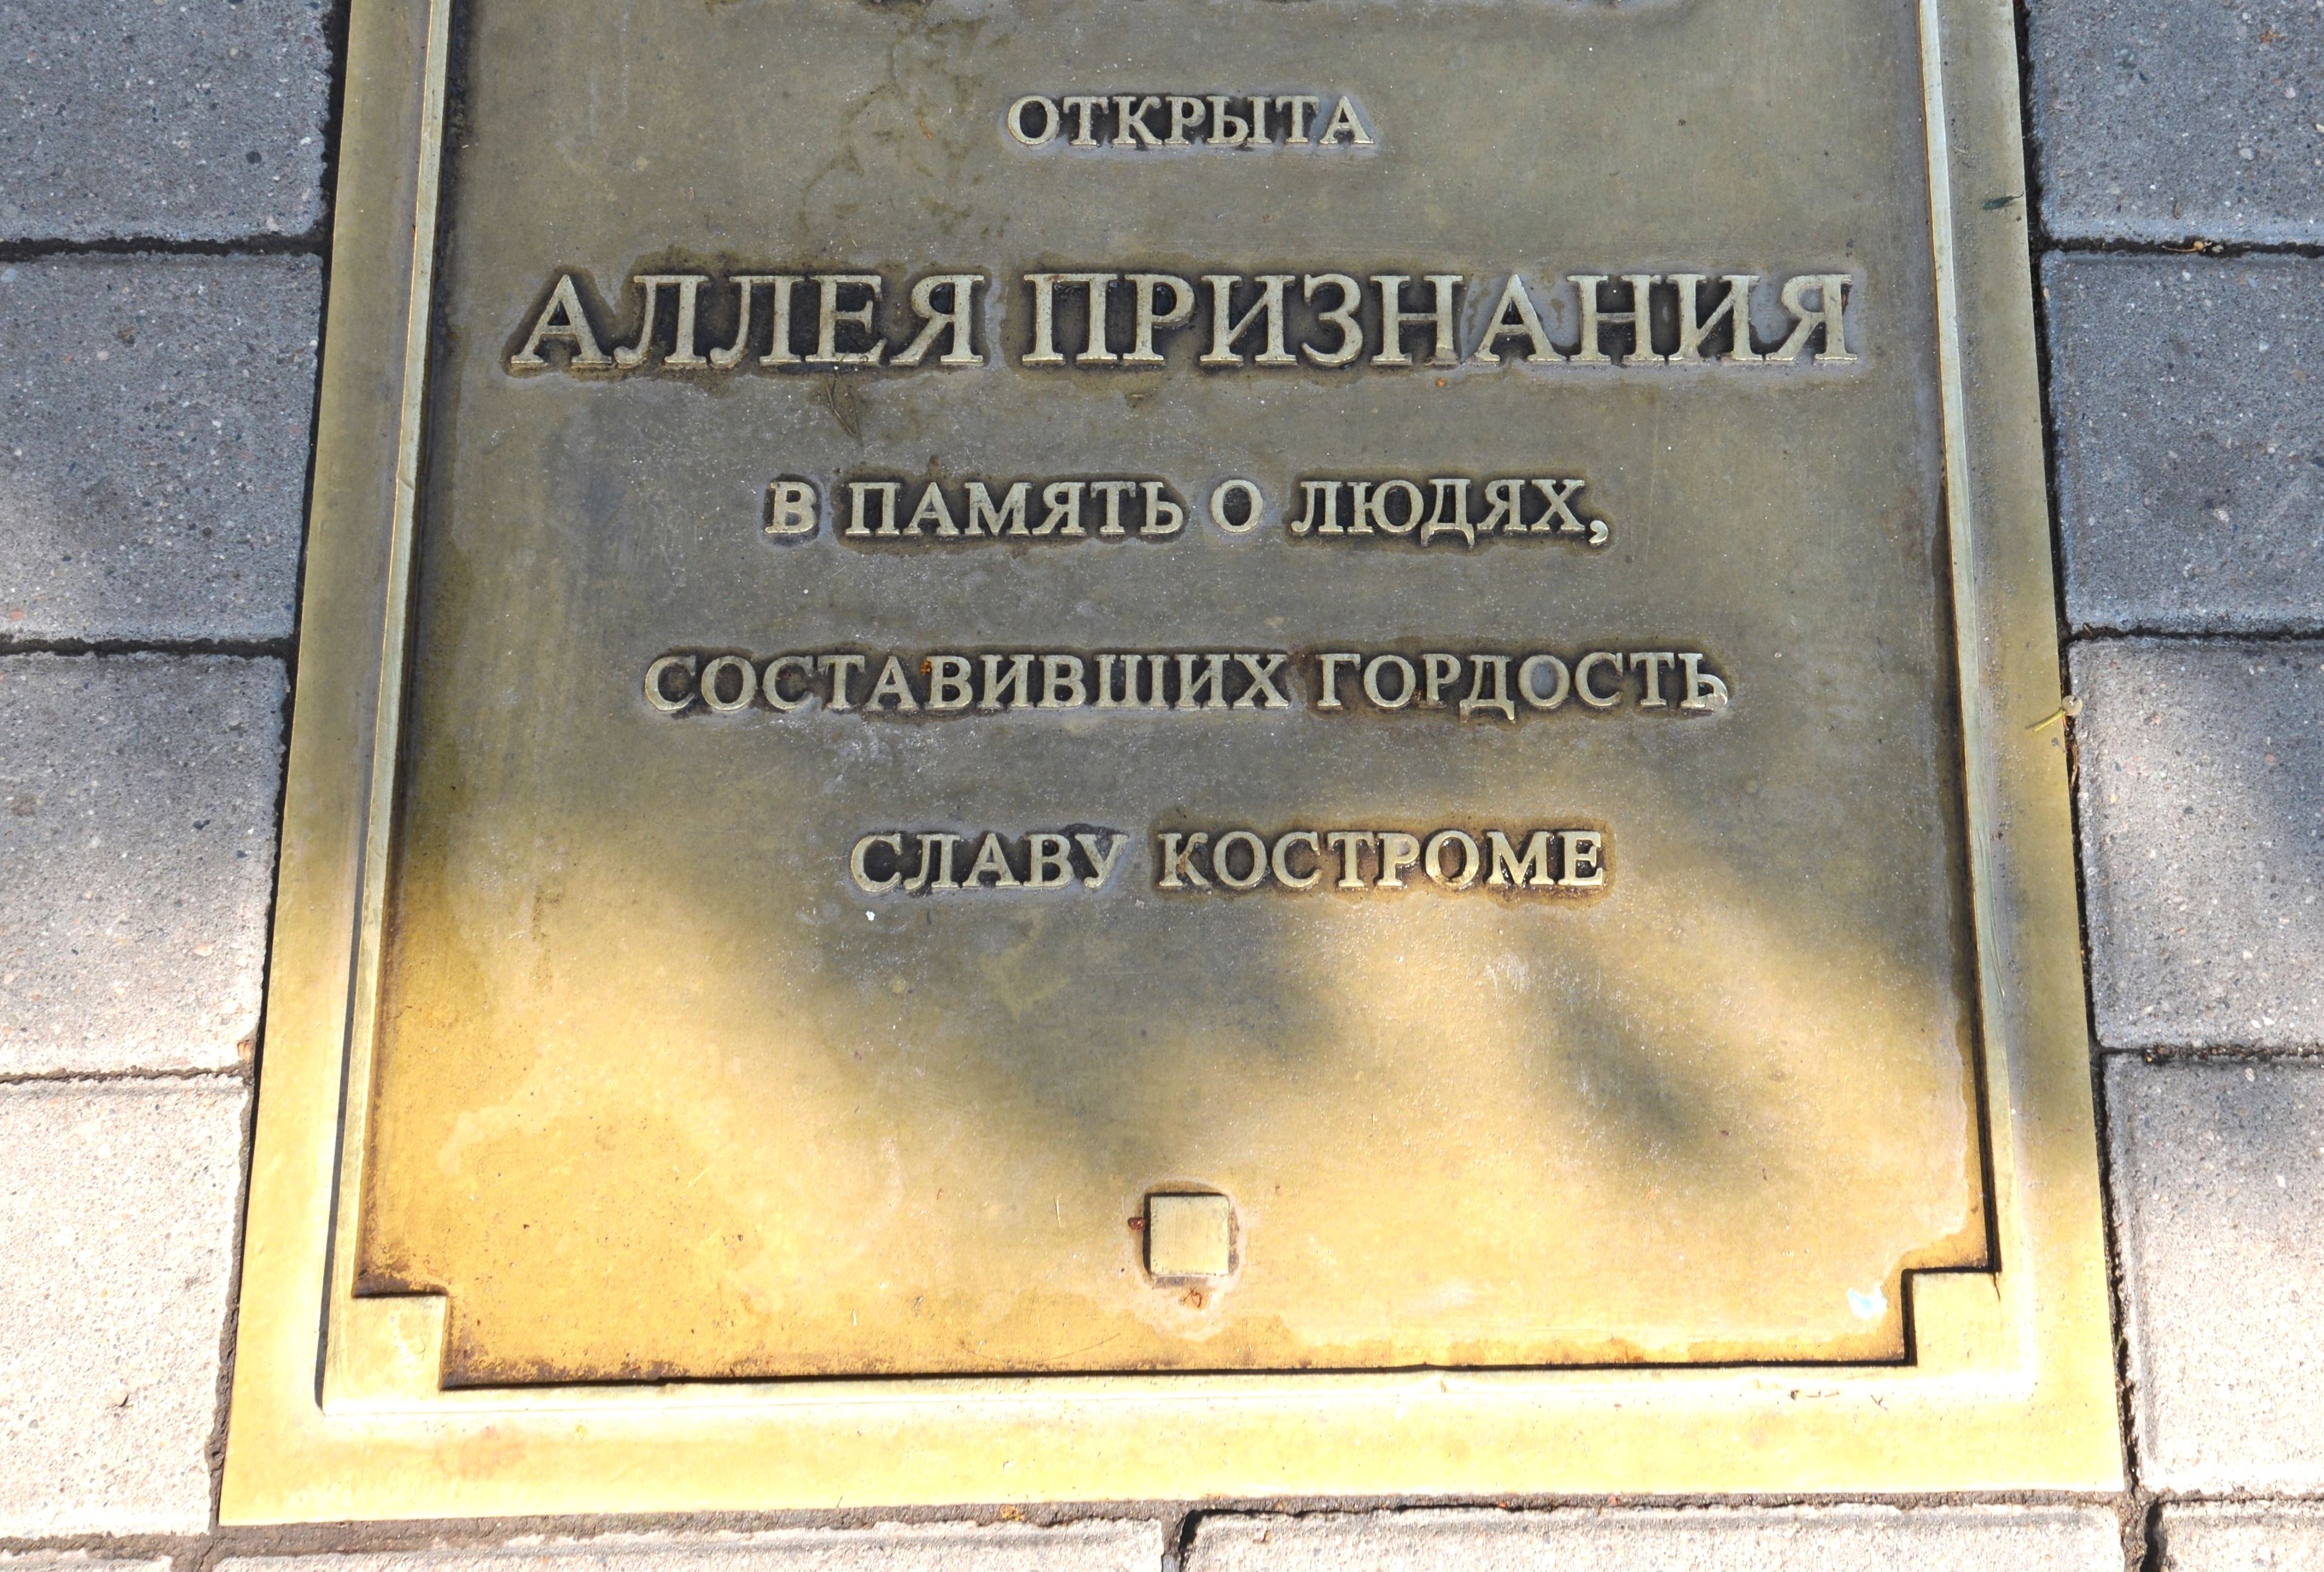 Аллею признания в Костроме пополнит новое имя